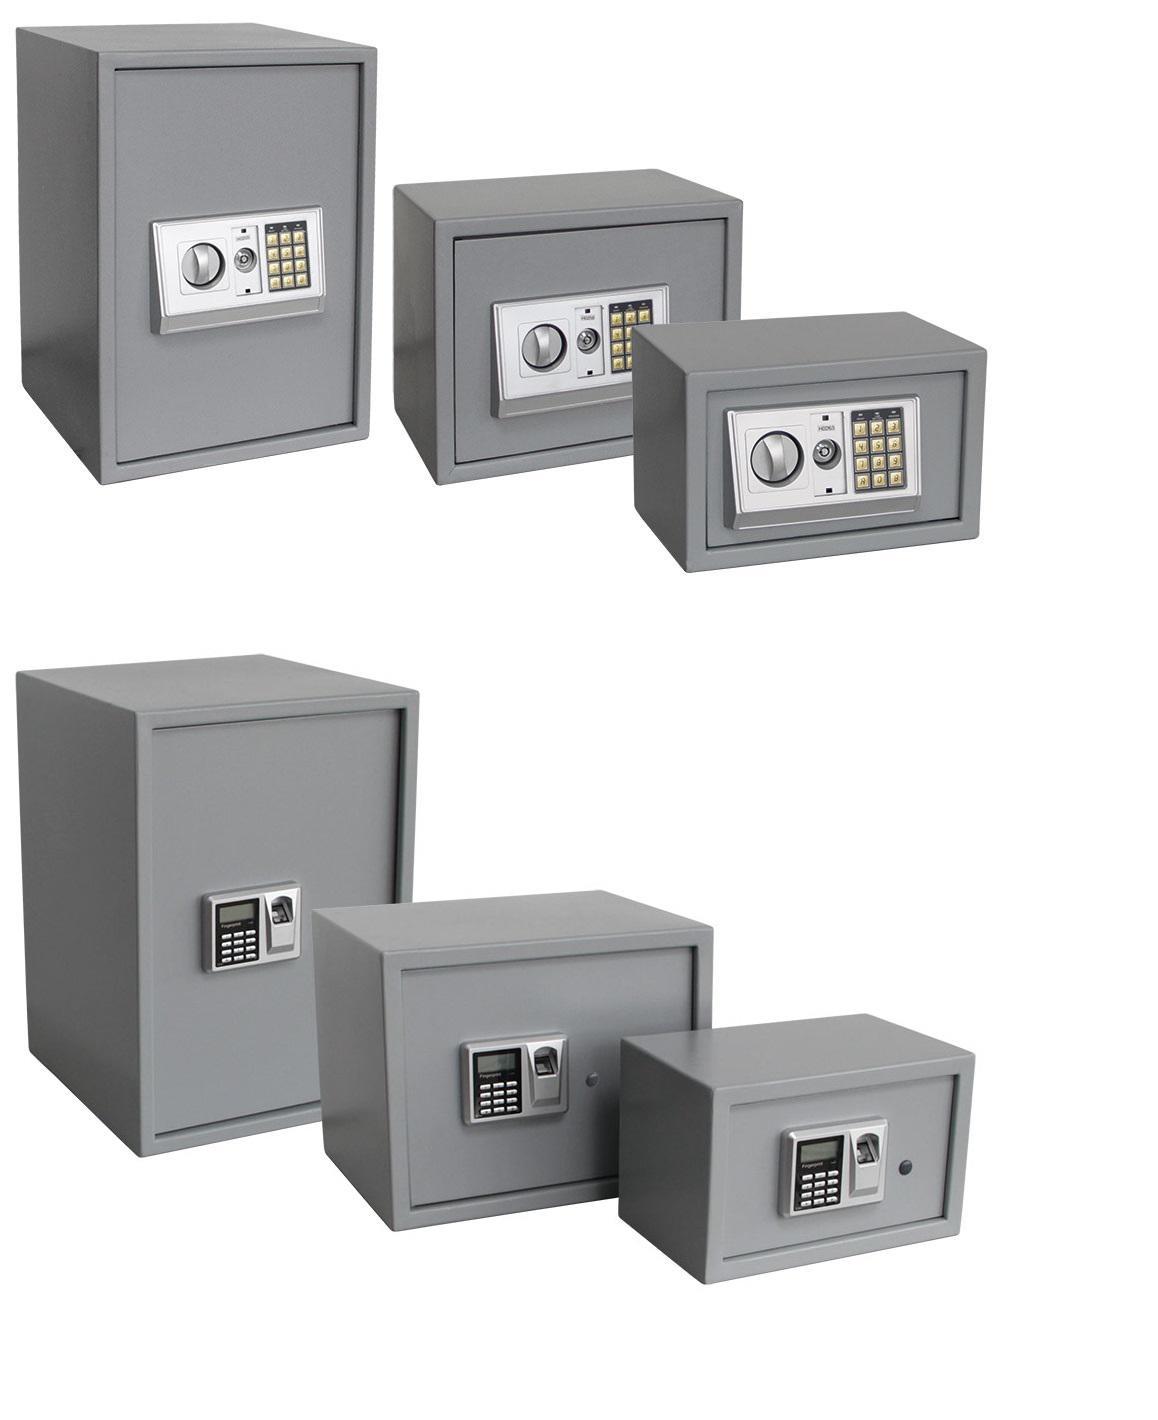 safe 3990 security tresor mini m beltresor wandtresor schliessfach banksafe mit. Black Bedroom Furniture Sets. Home Design Ideas